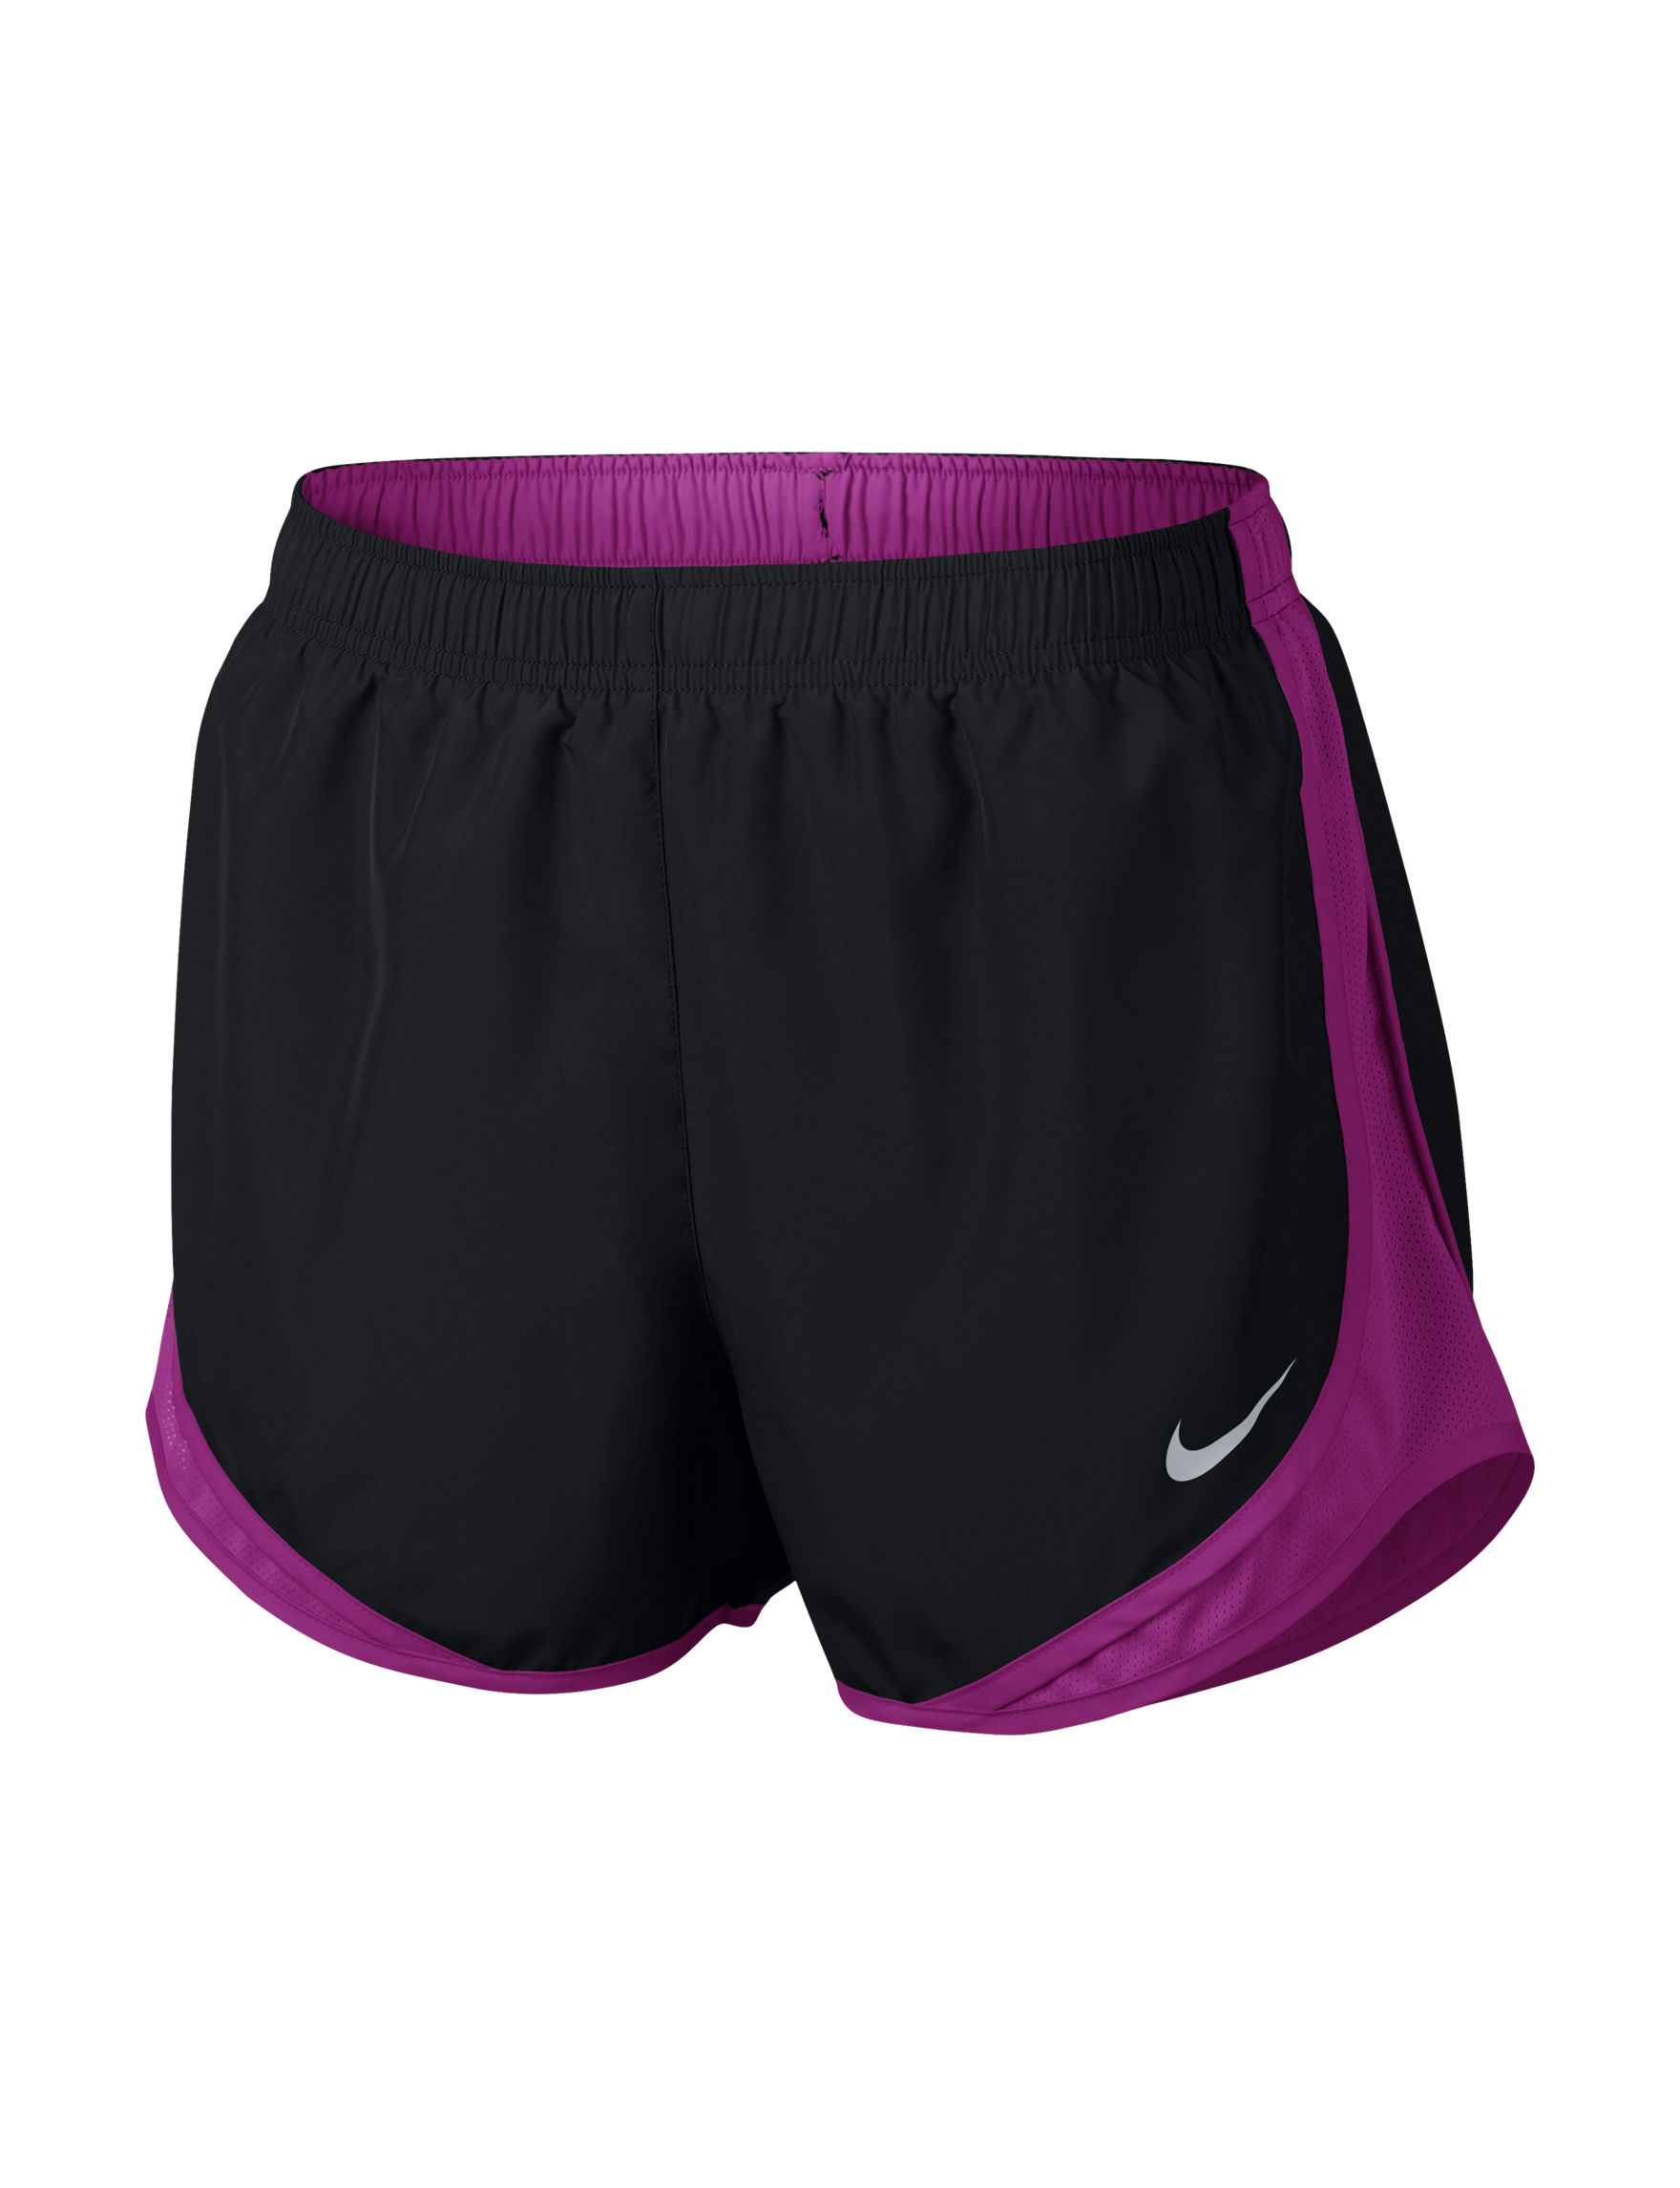 Nike Multi Active